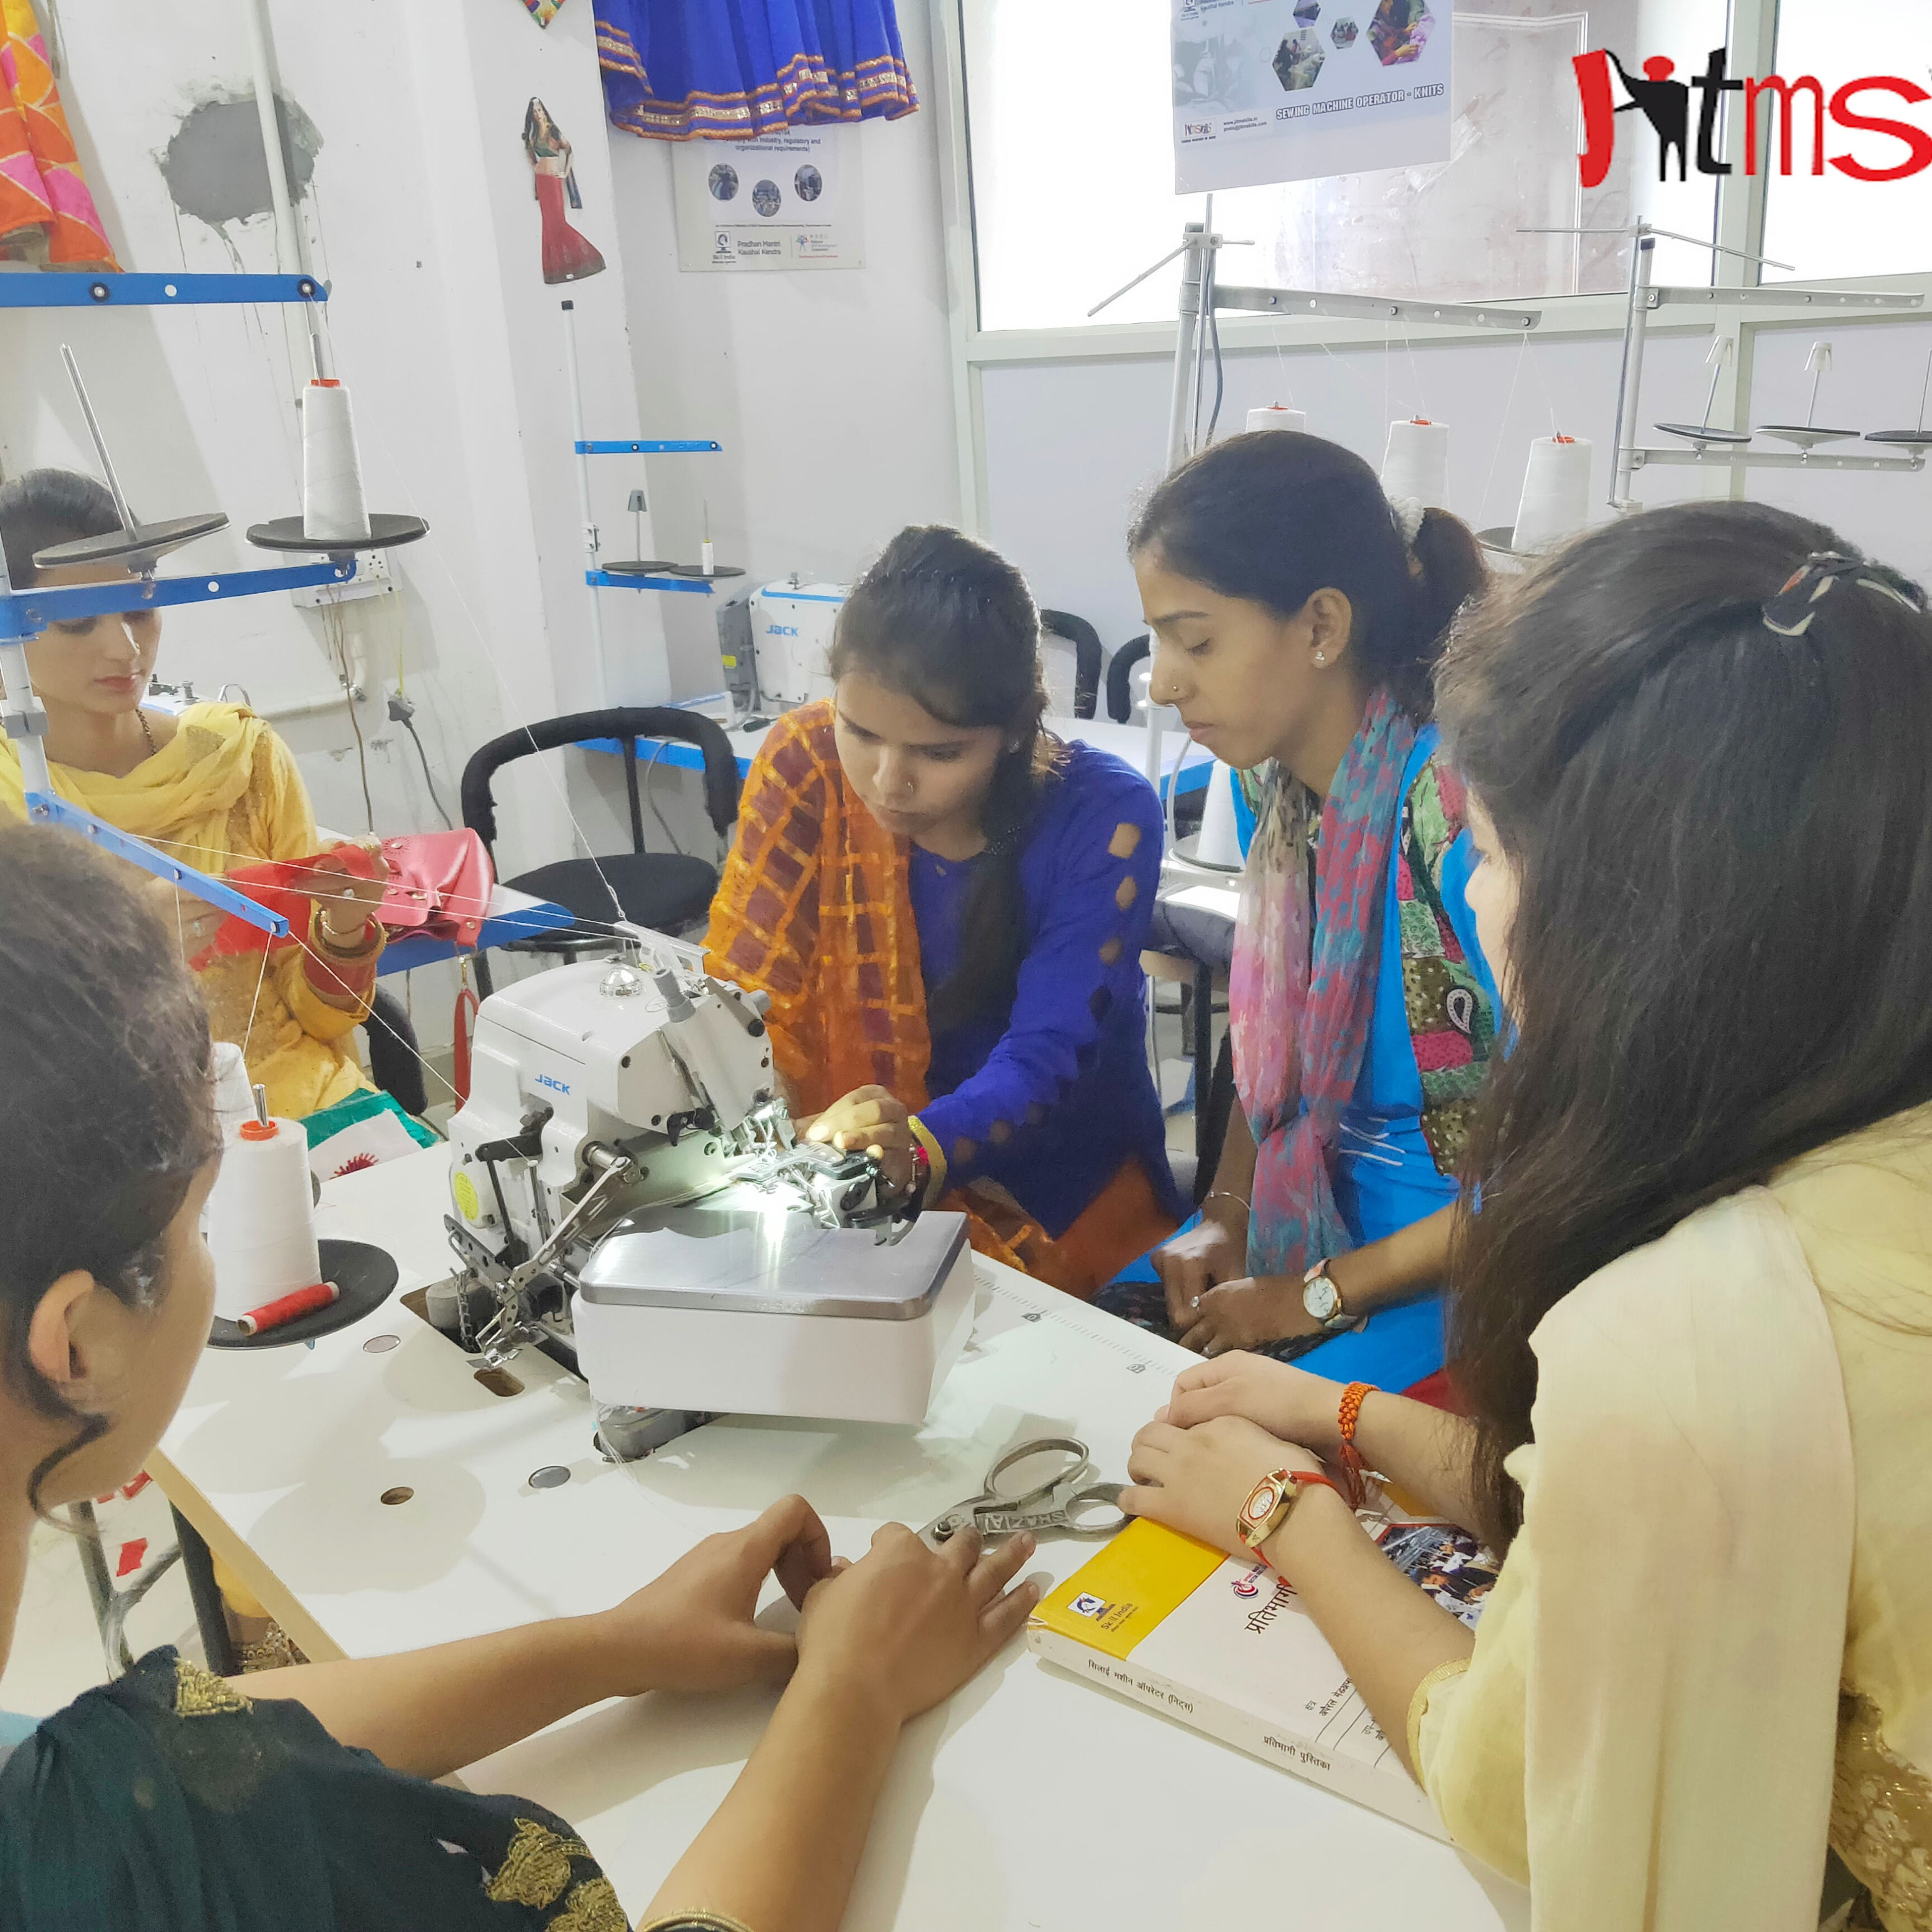 Jitm Skills Pvt Ltd Hamirpur Himachal Pradesh Training Session